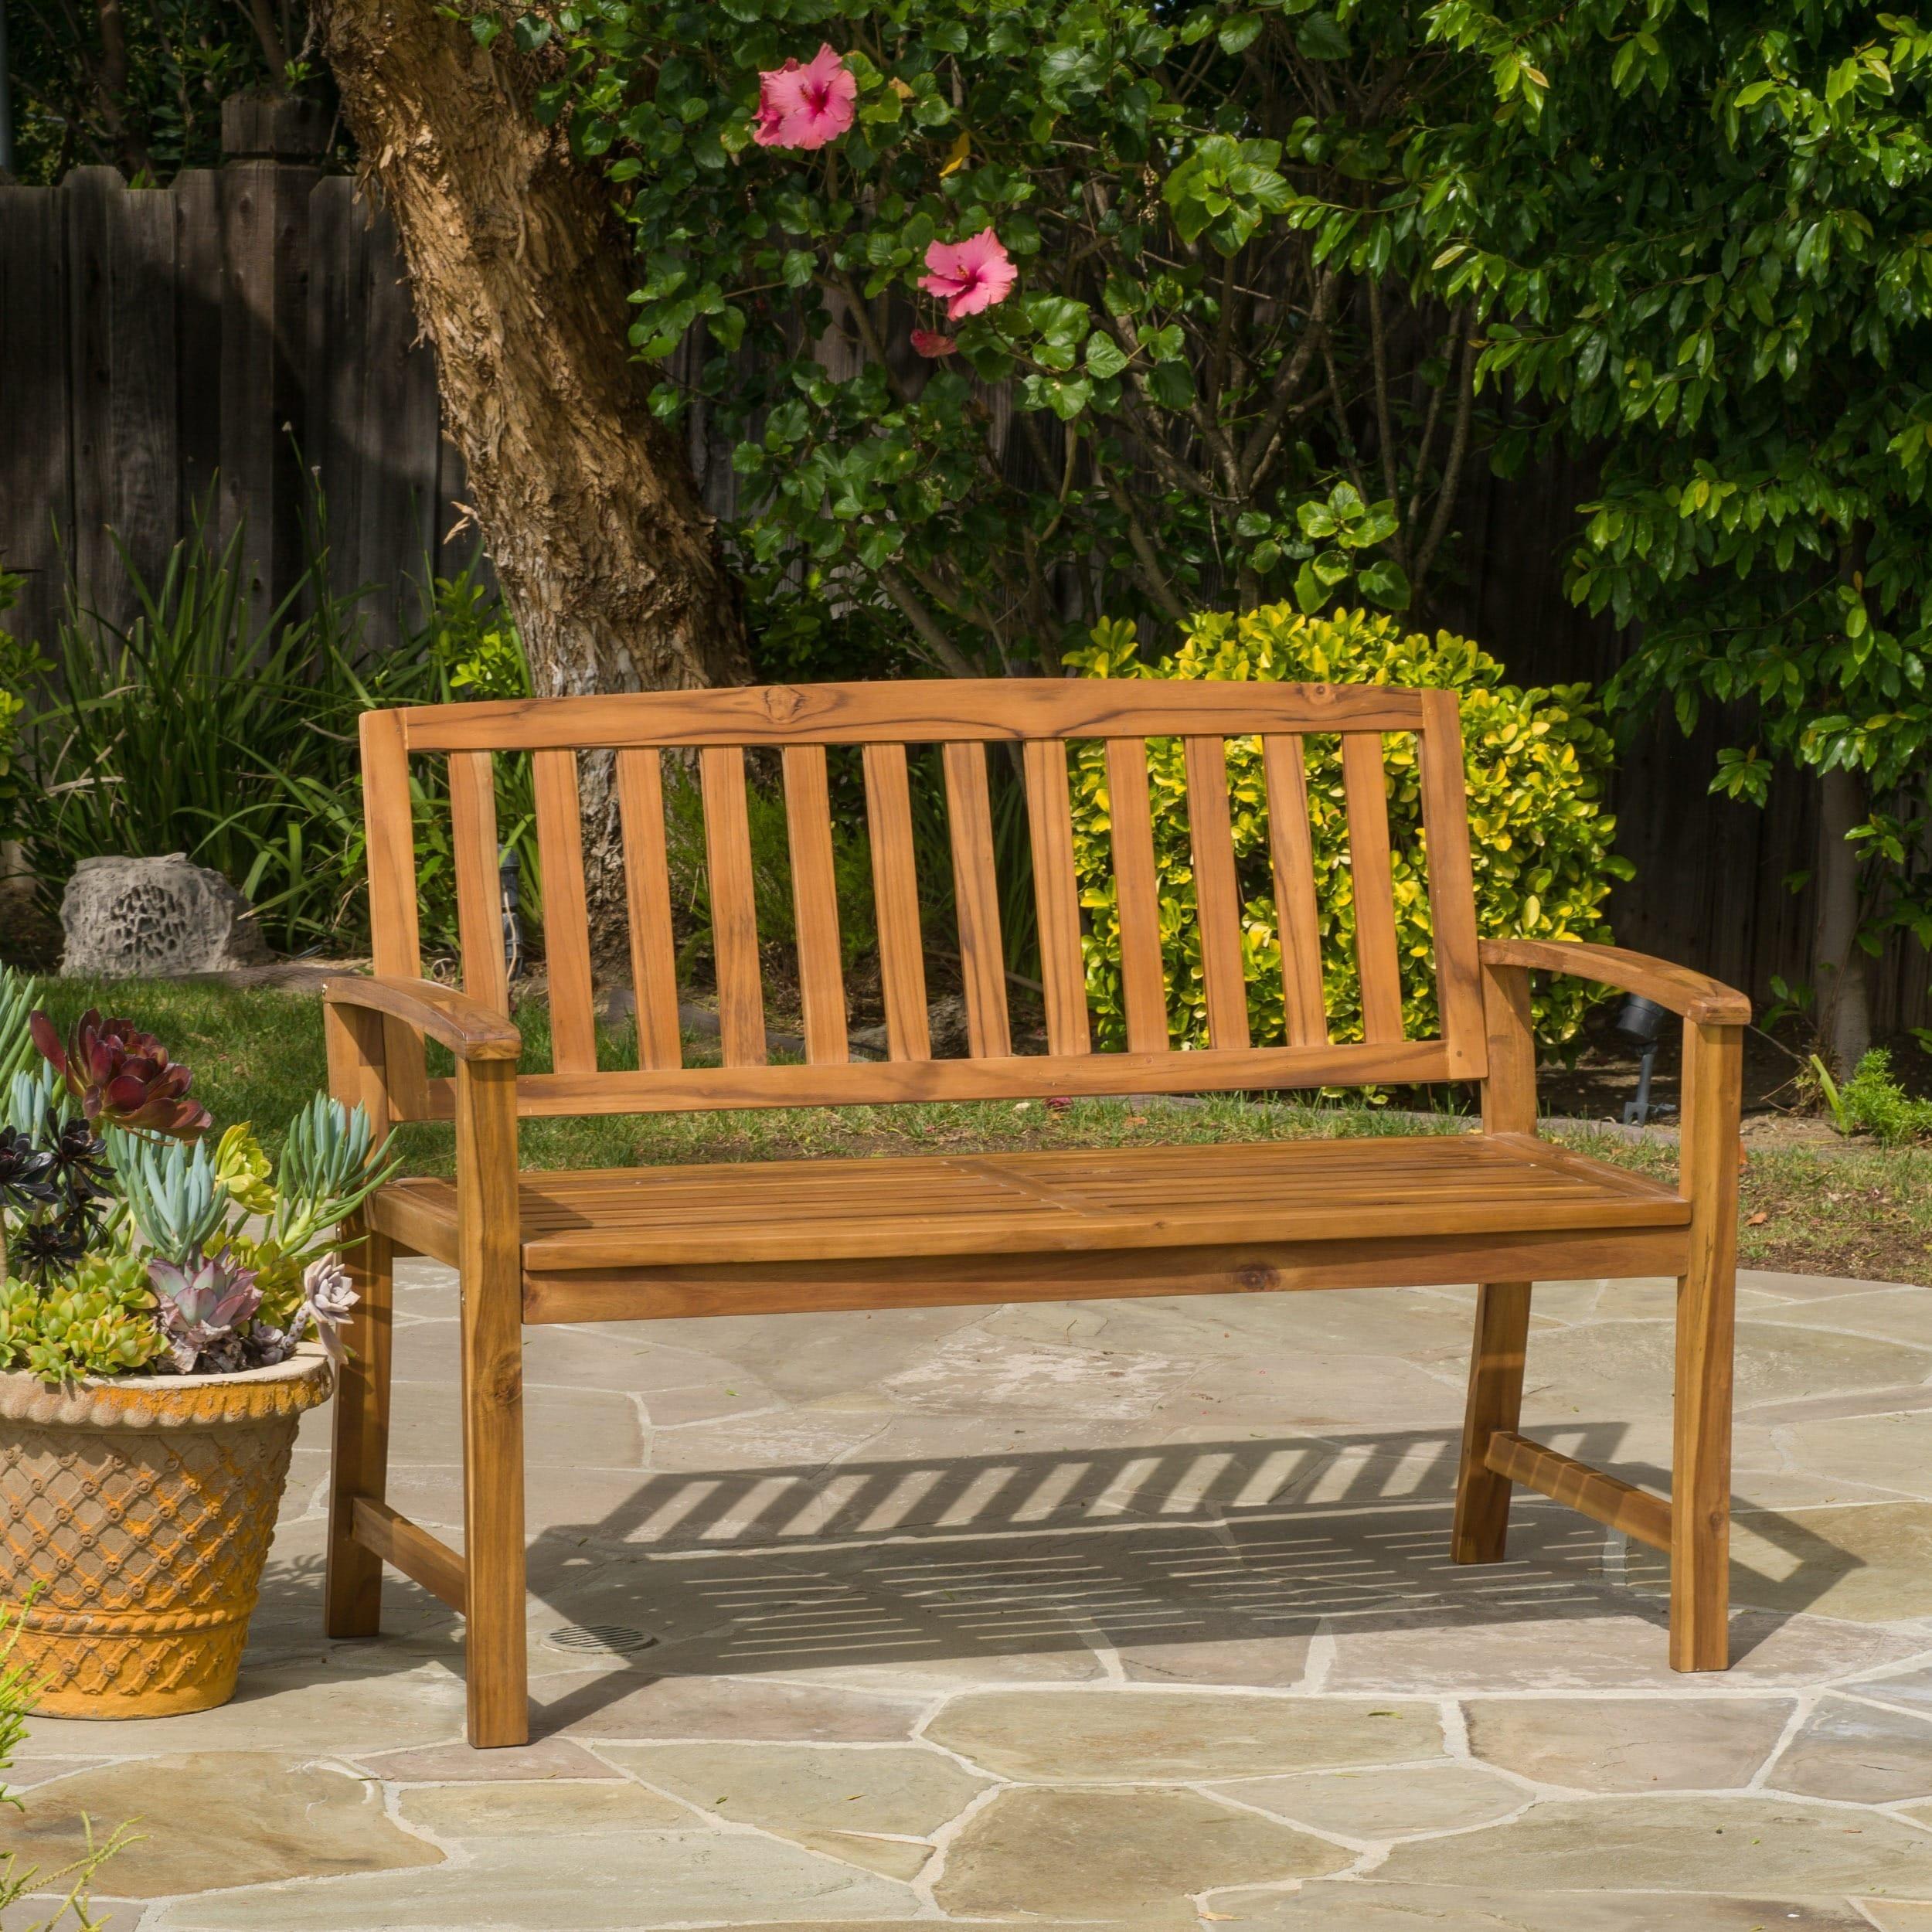 hayneedle x patio bench standard in blazing outdoor needles cushion product master cfm